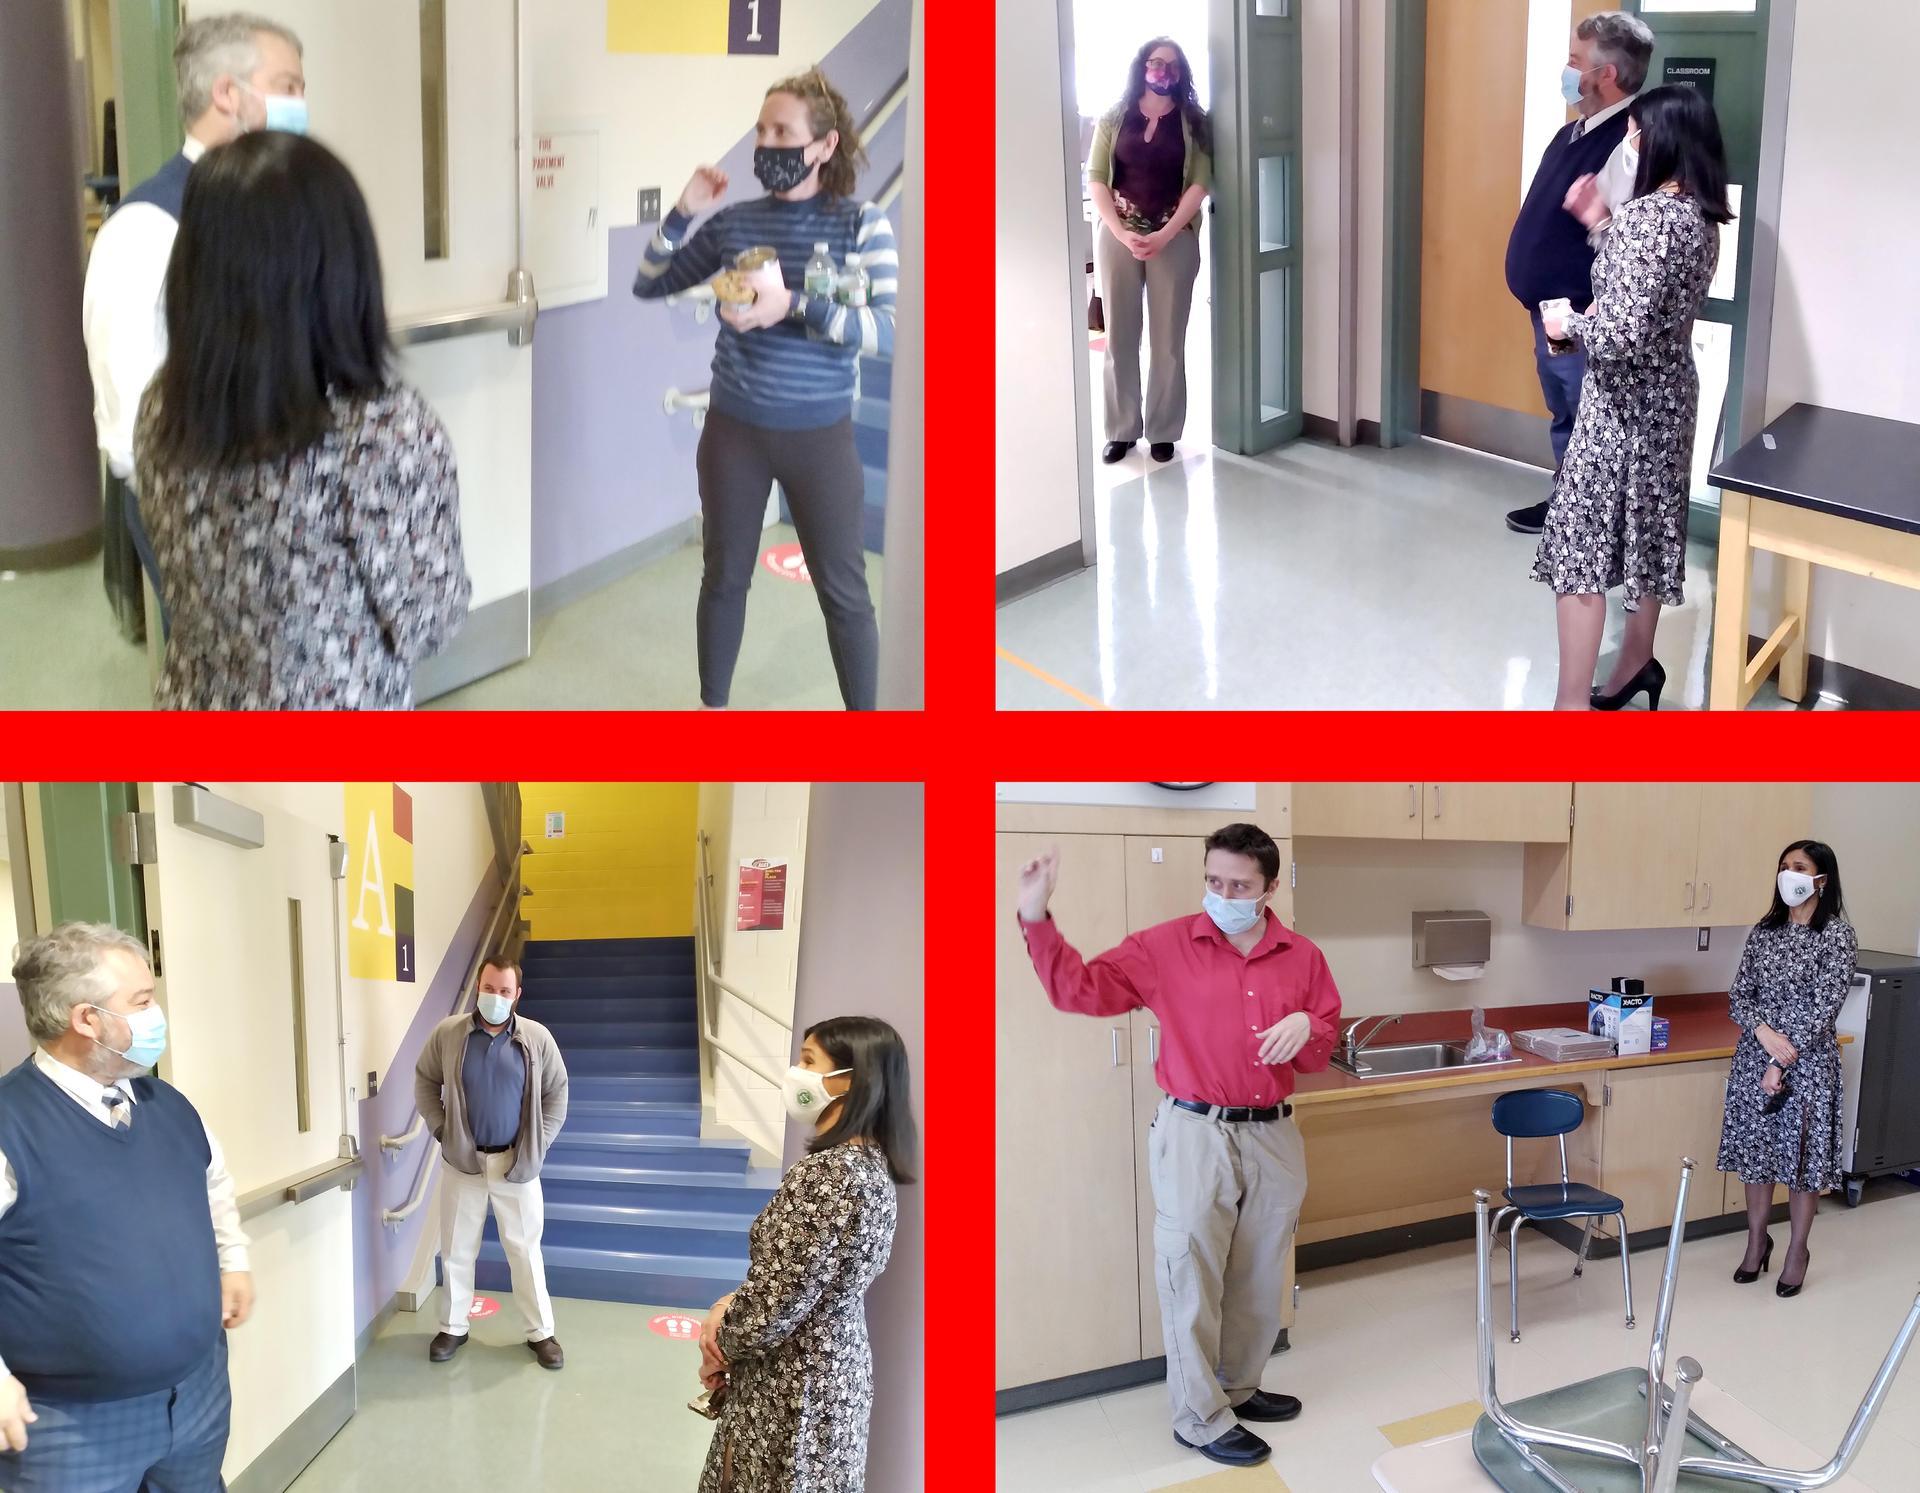 Four-tile image, superintendent talking to educators